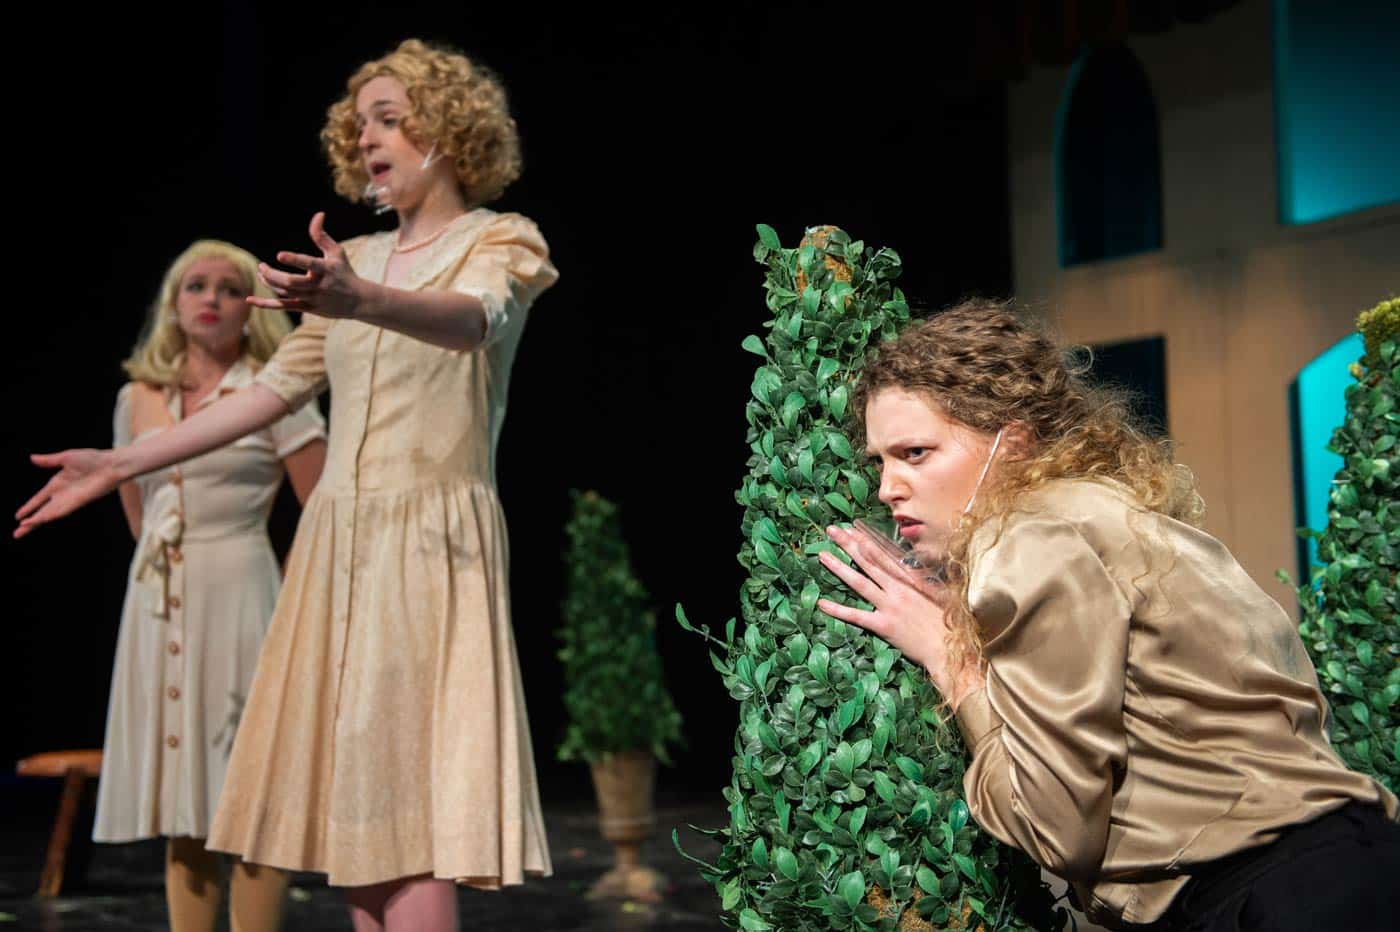 Beatrice overhears Hero and Ursula discussing Benedick